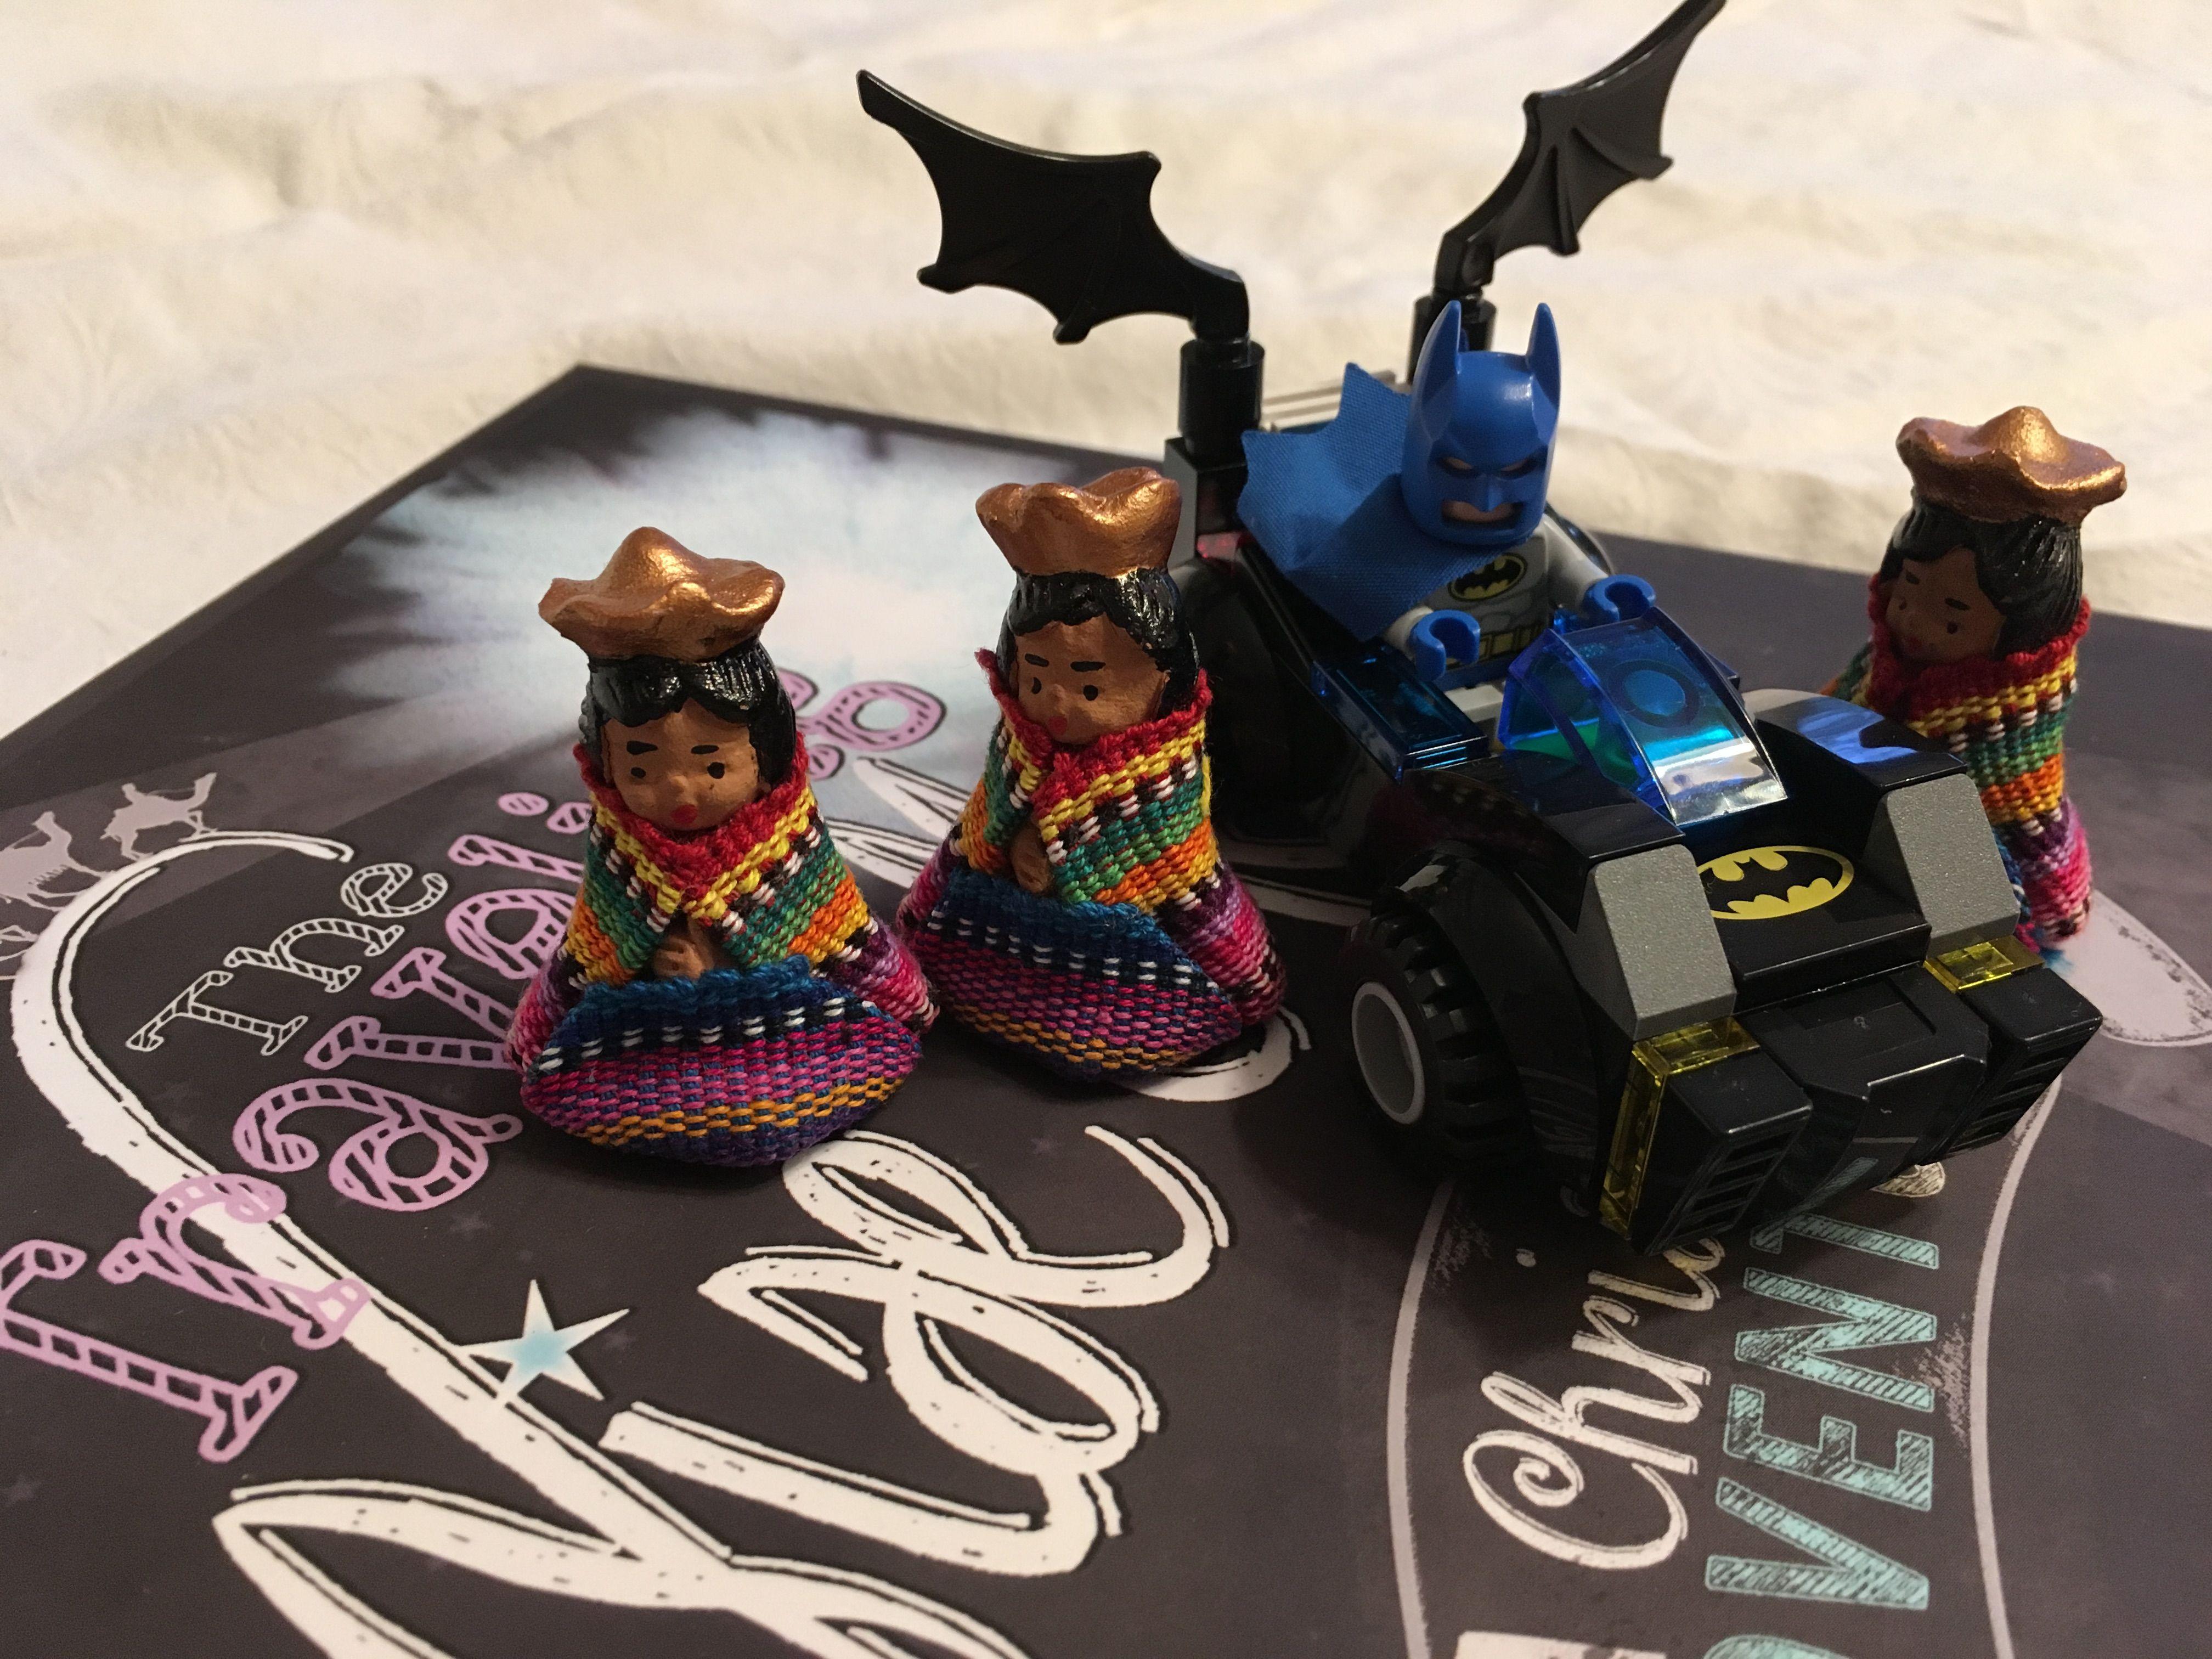 The Traveling Wise Men ran into bat man! www.travelingwisemen.com